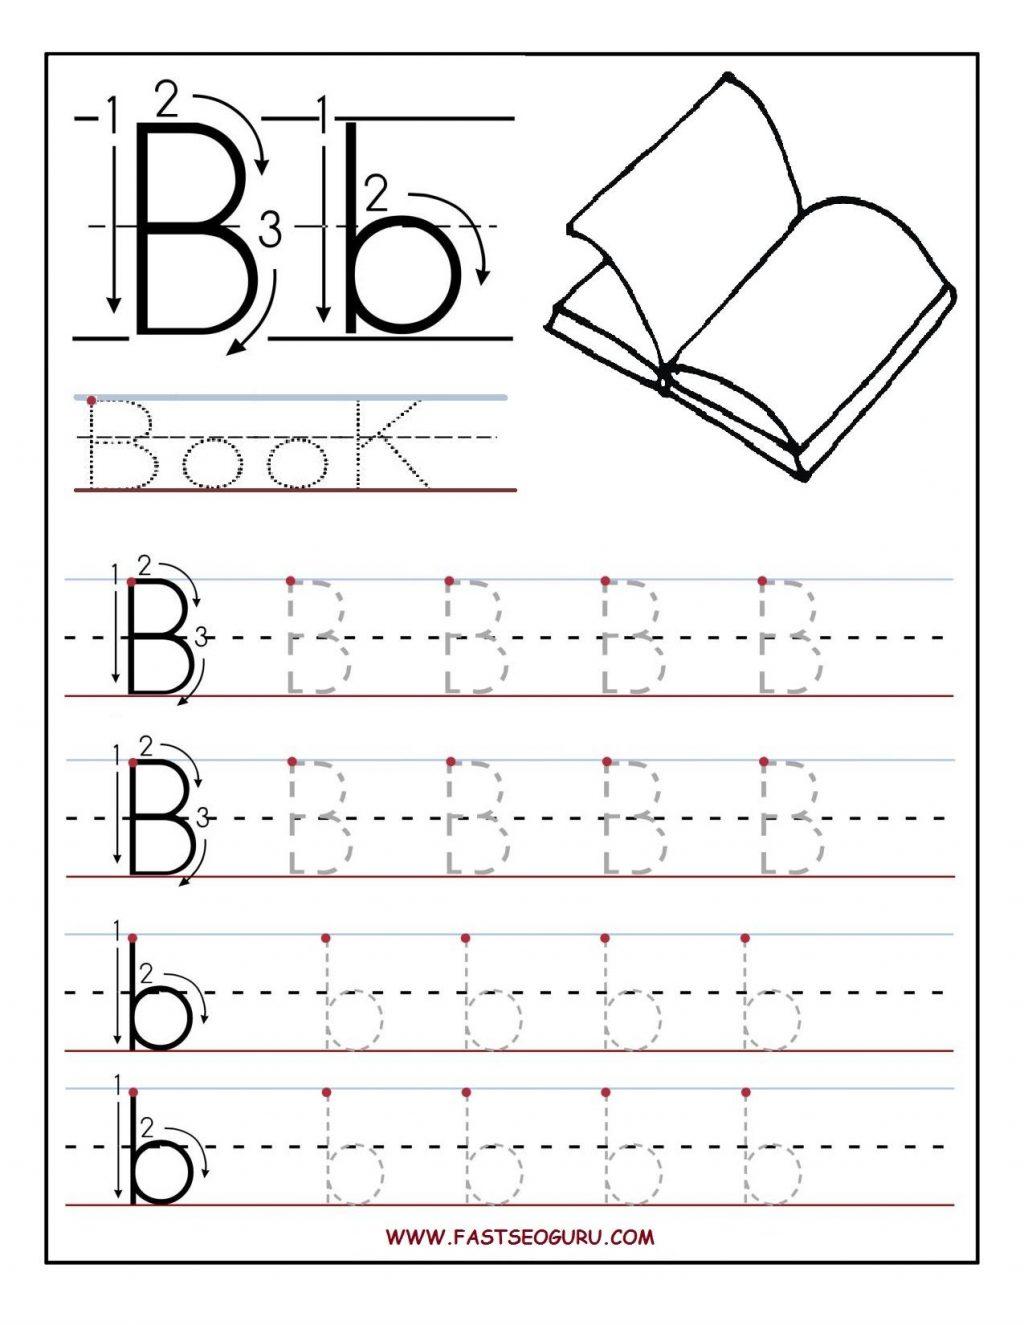 Worksheet ~ Worksheet Ideas Printable Letter Tracing throughout Letter K Tracing Worksheets